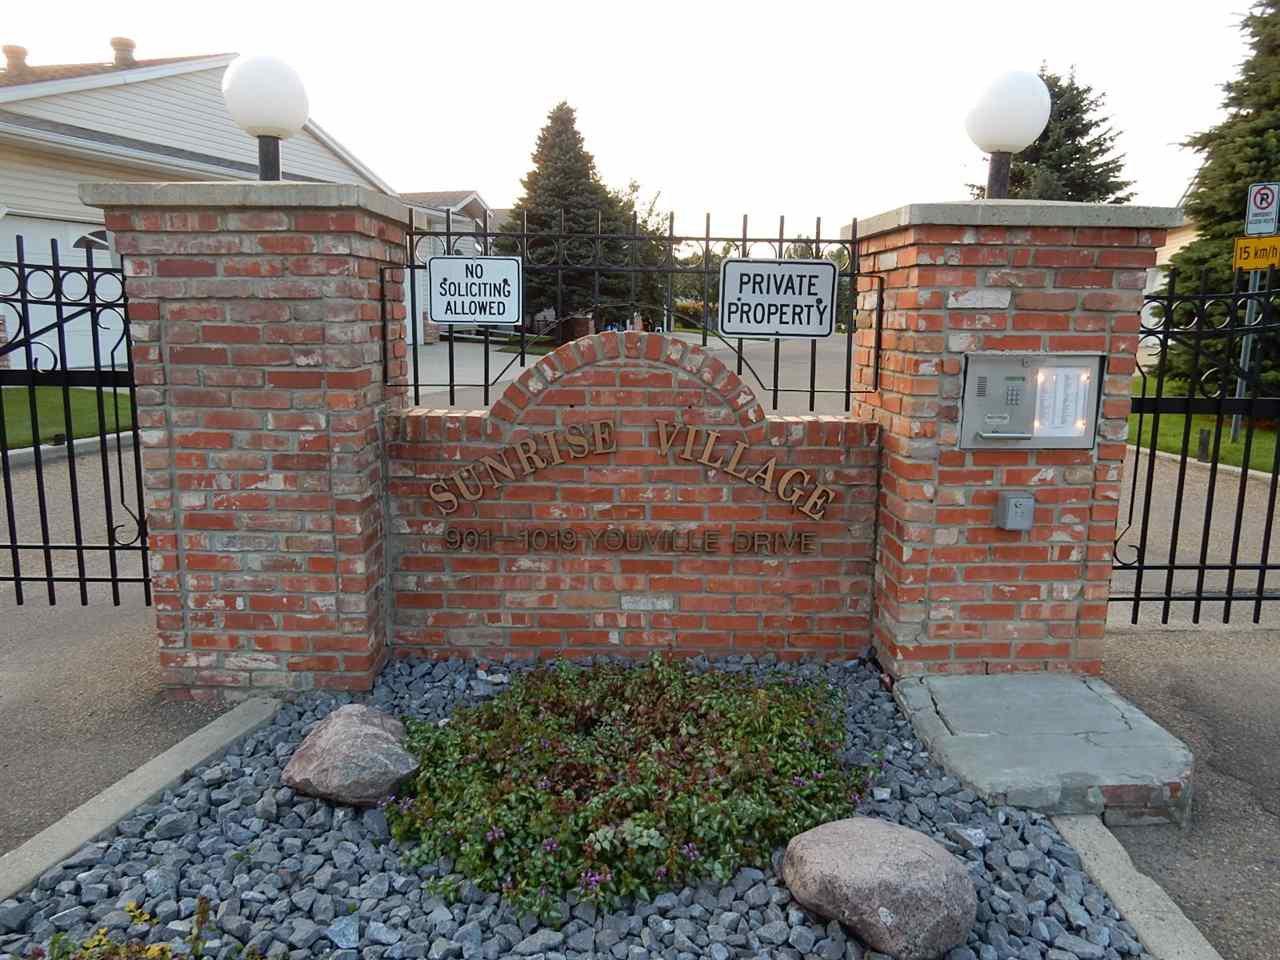 Main Photo: 947 Youville Drive in Edmonton: Zone 29 House Half Duplex for sale : MLS®# E4182684